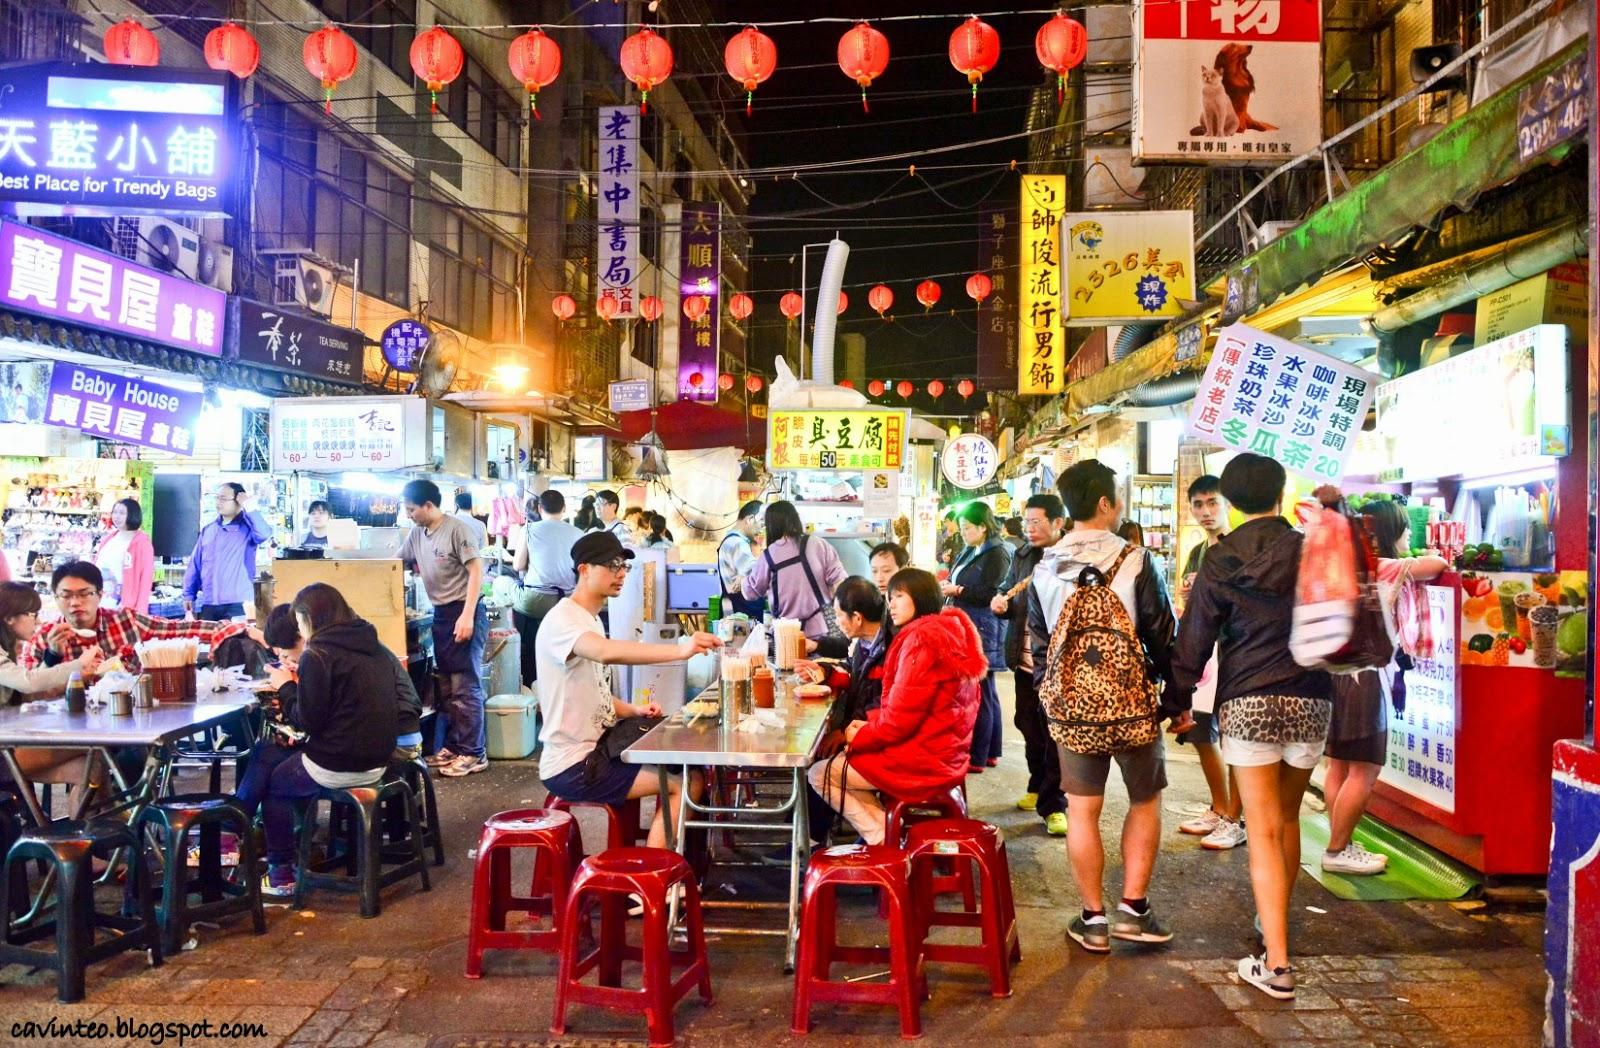 Taiwan Mandarin Institute TaipeiRaohe Street Night Market - Taiwan ...